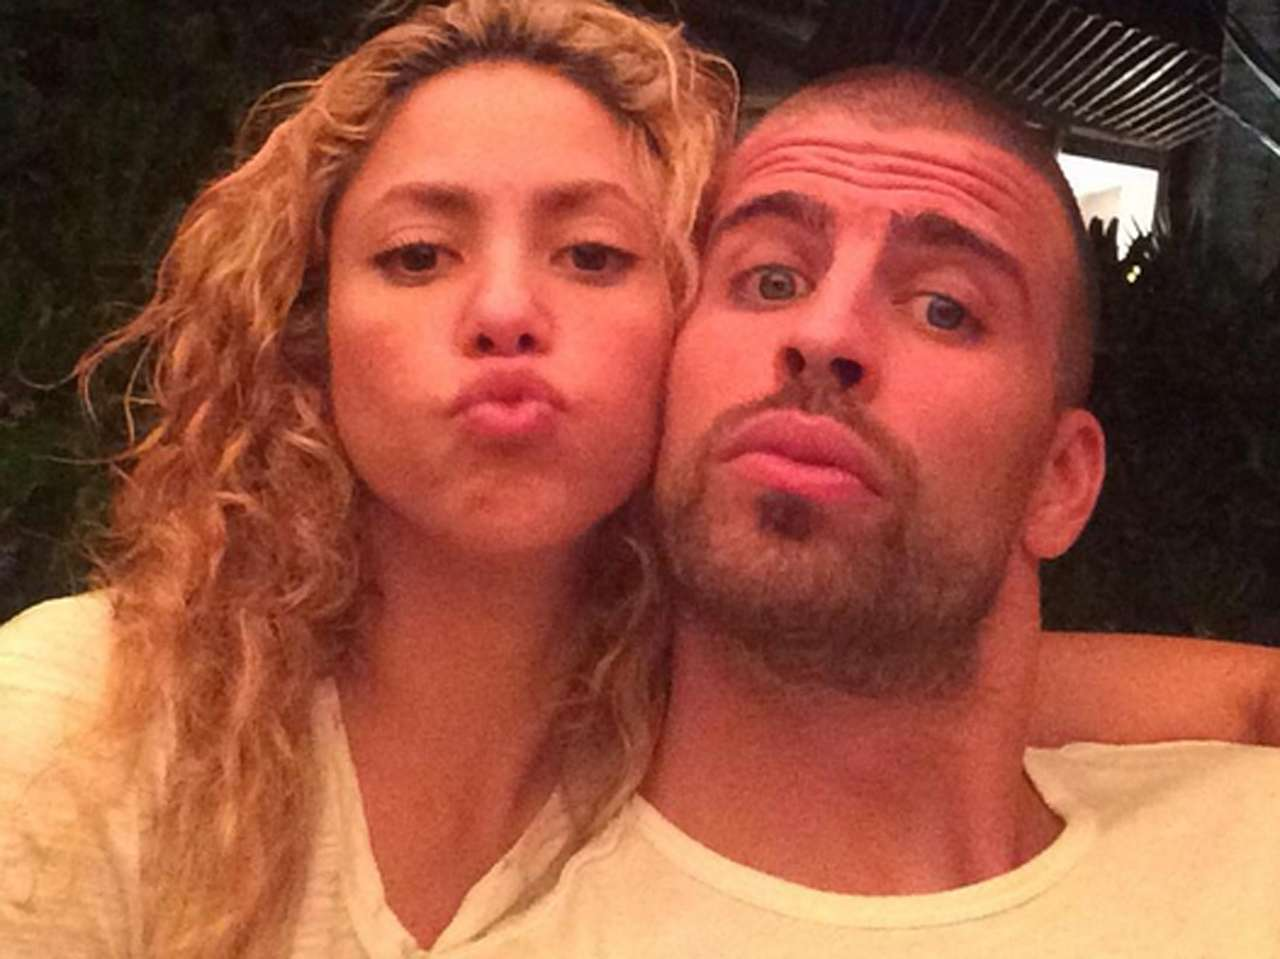 Shakira y Gerard Piqué. Foto: Twitter/@3gerardpique